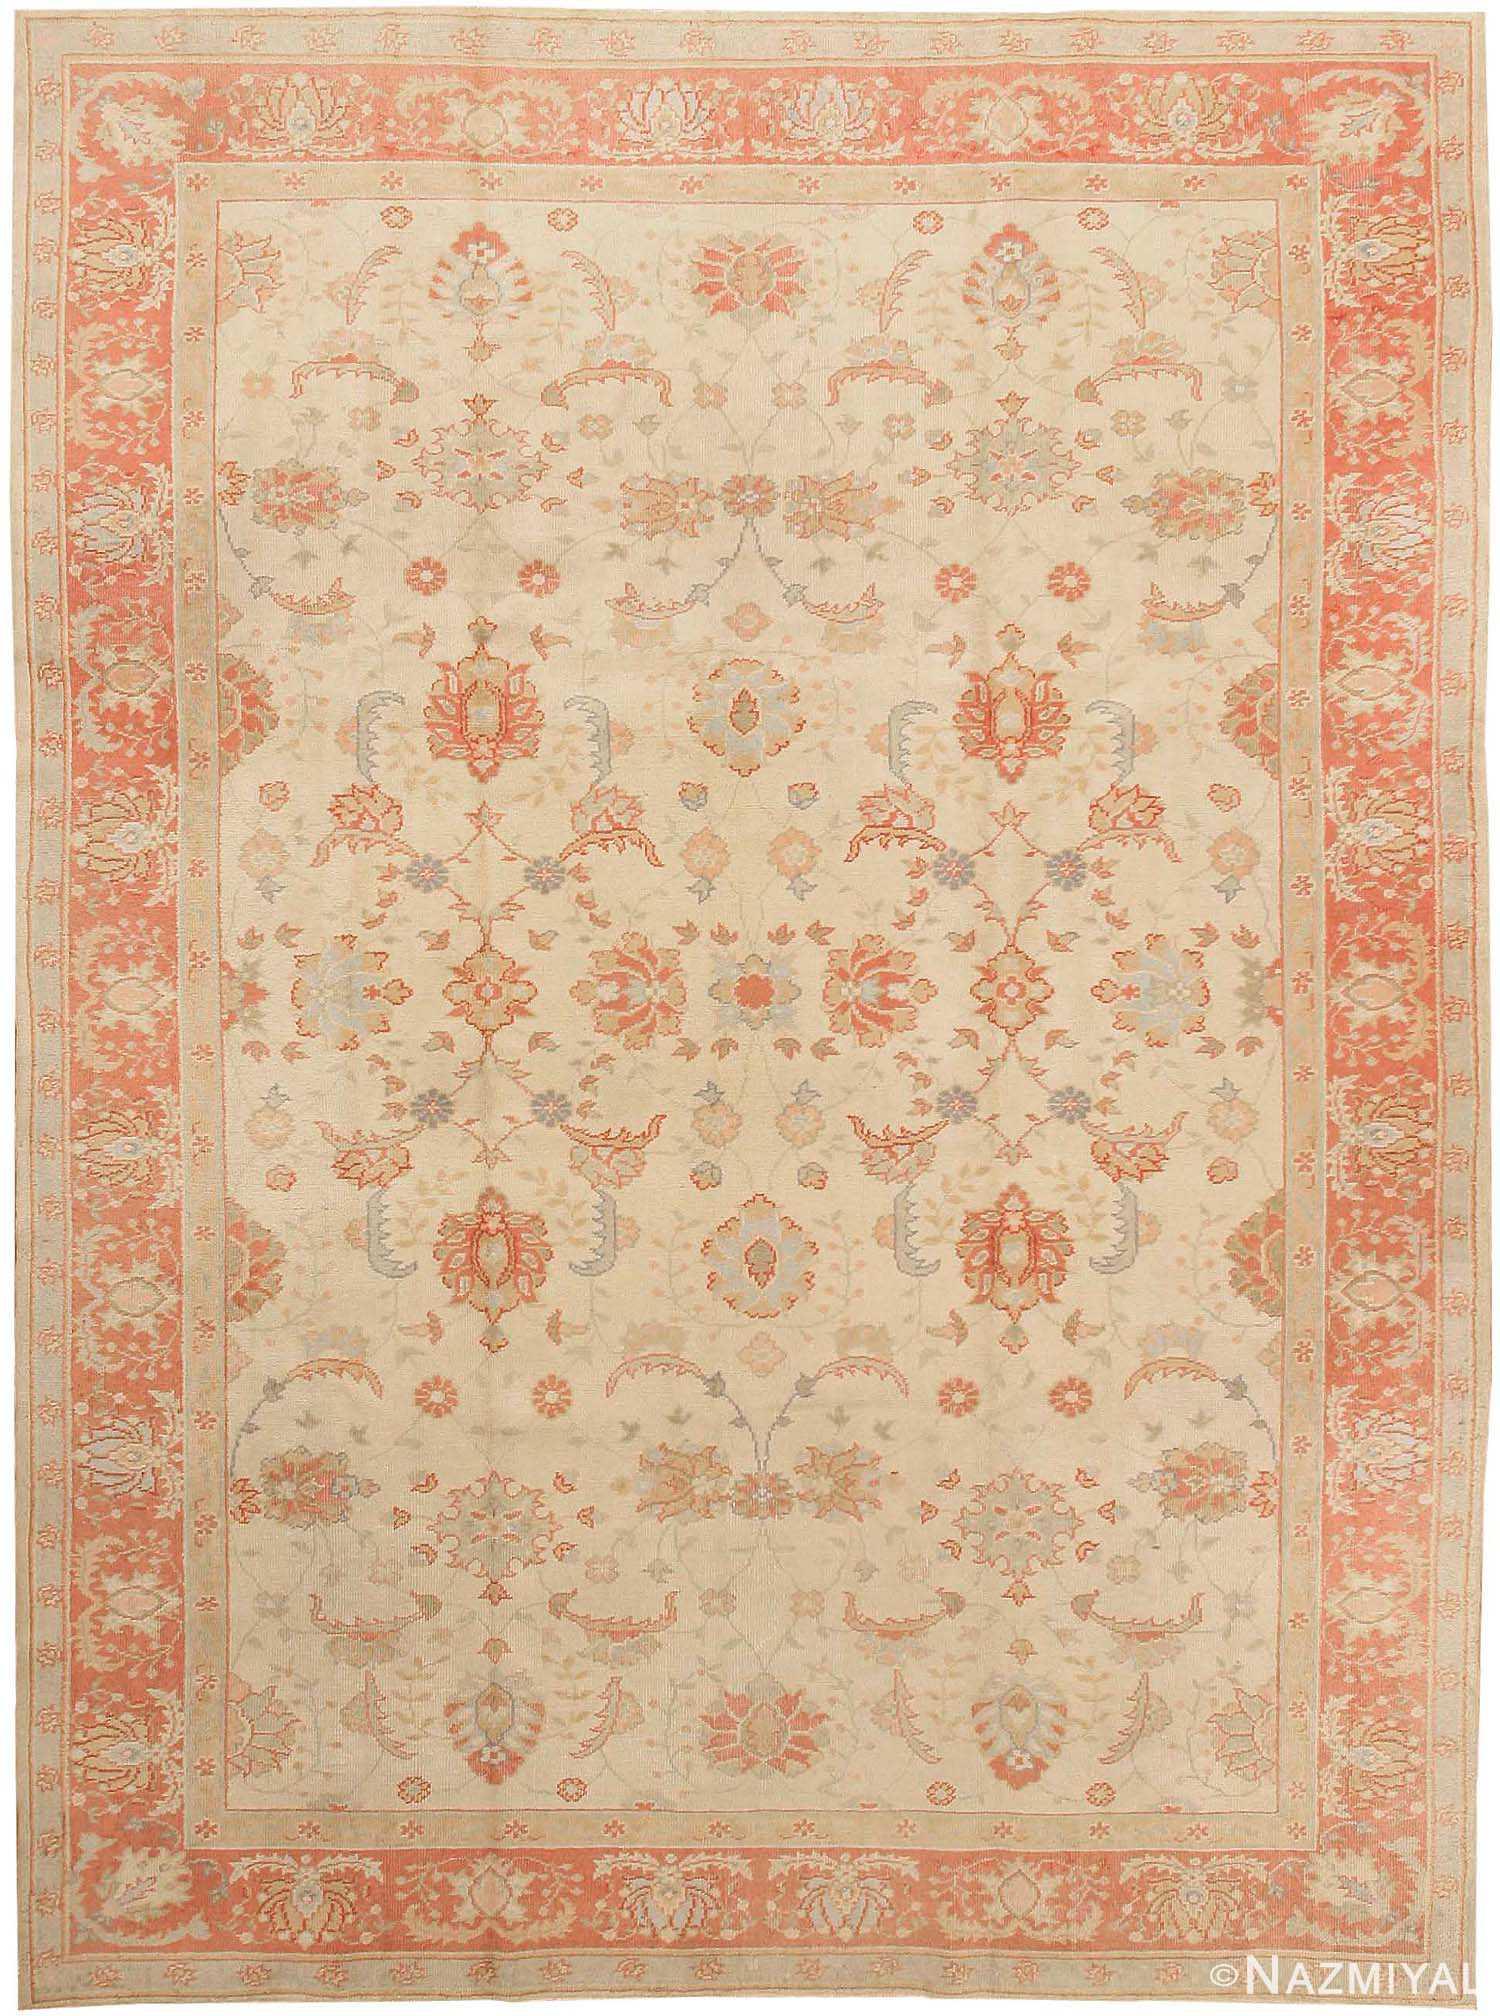 Oushak Rug Antique Turkish Carpet 43363 By Nazmiyal